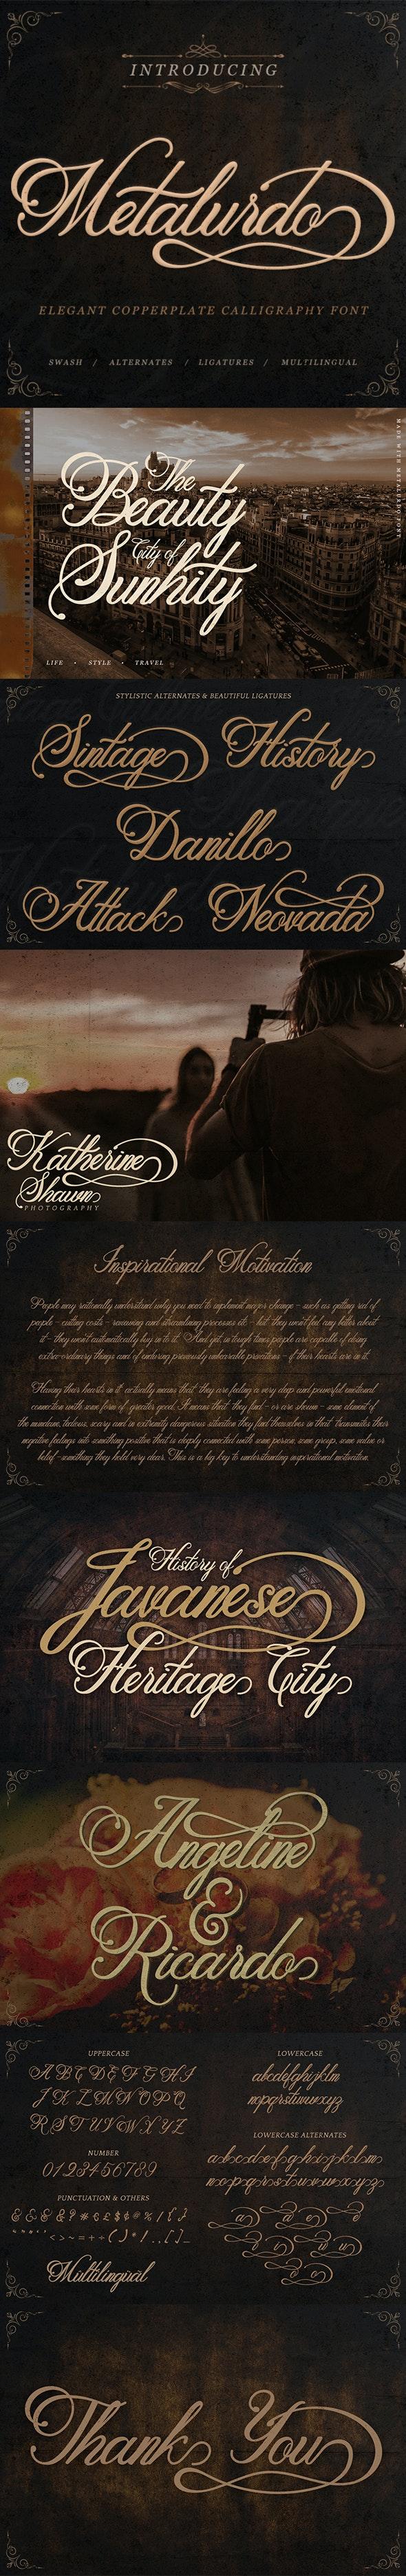 Metalurdo - Calligraphy Script